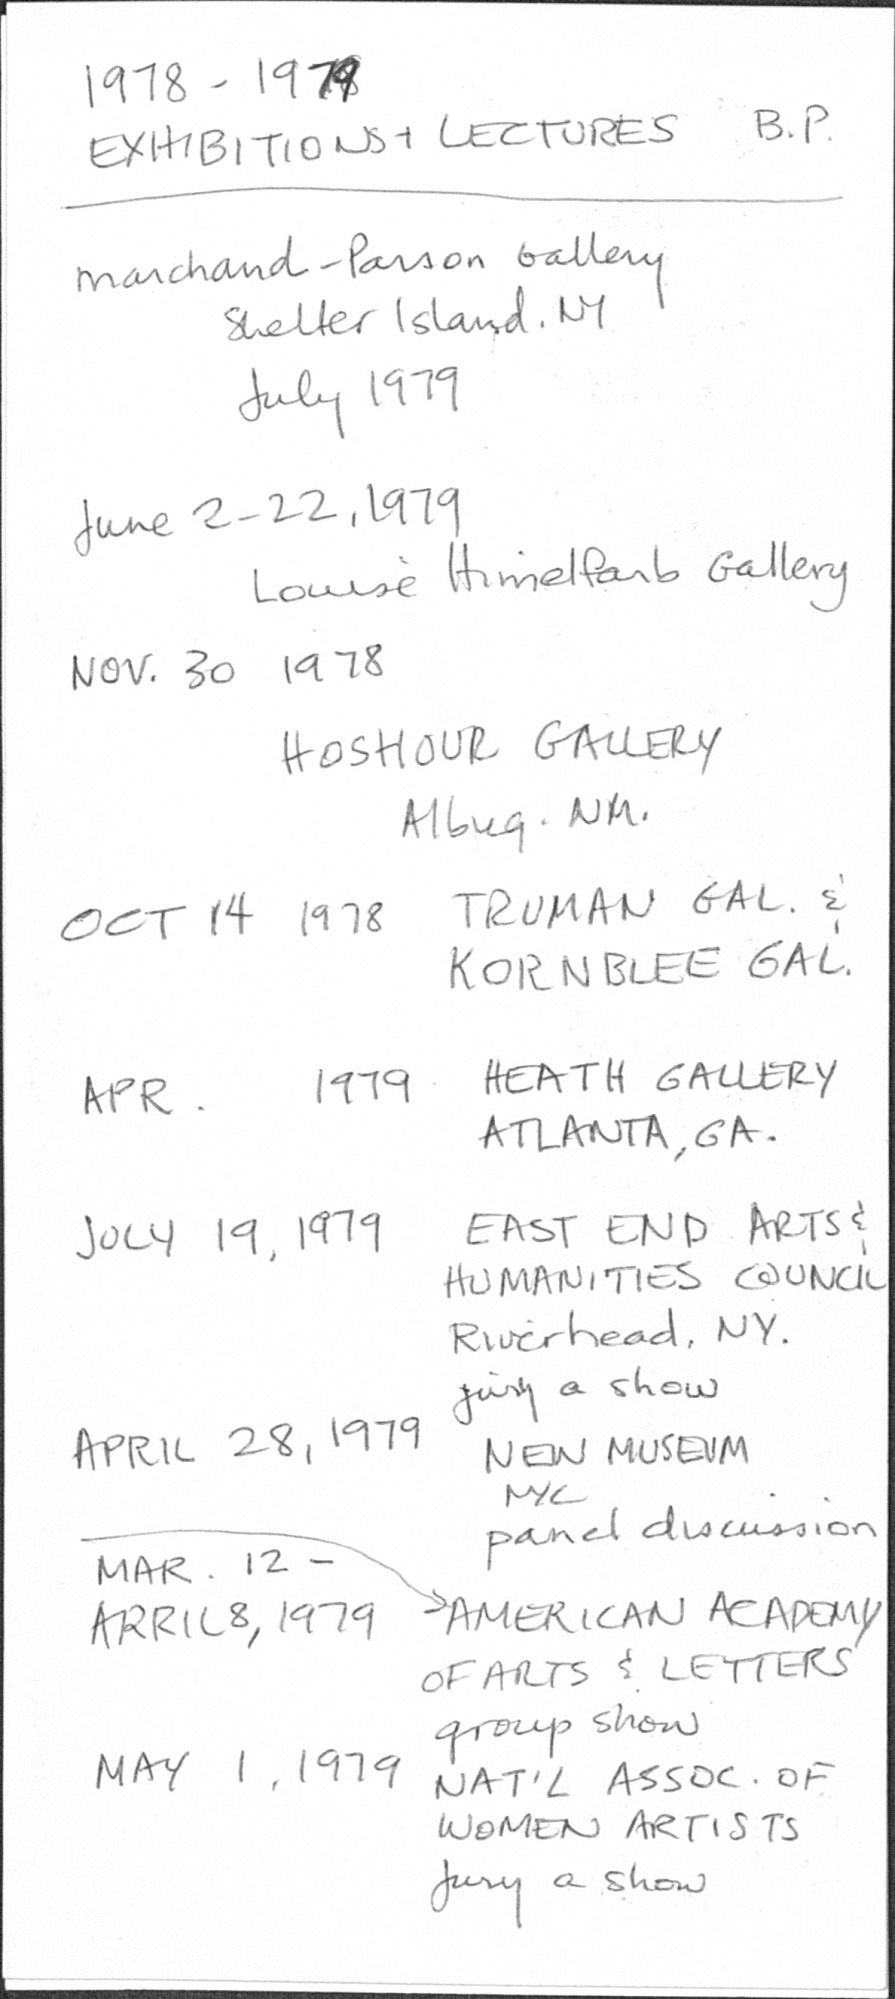 General Exhibitions